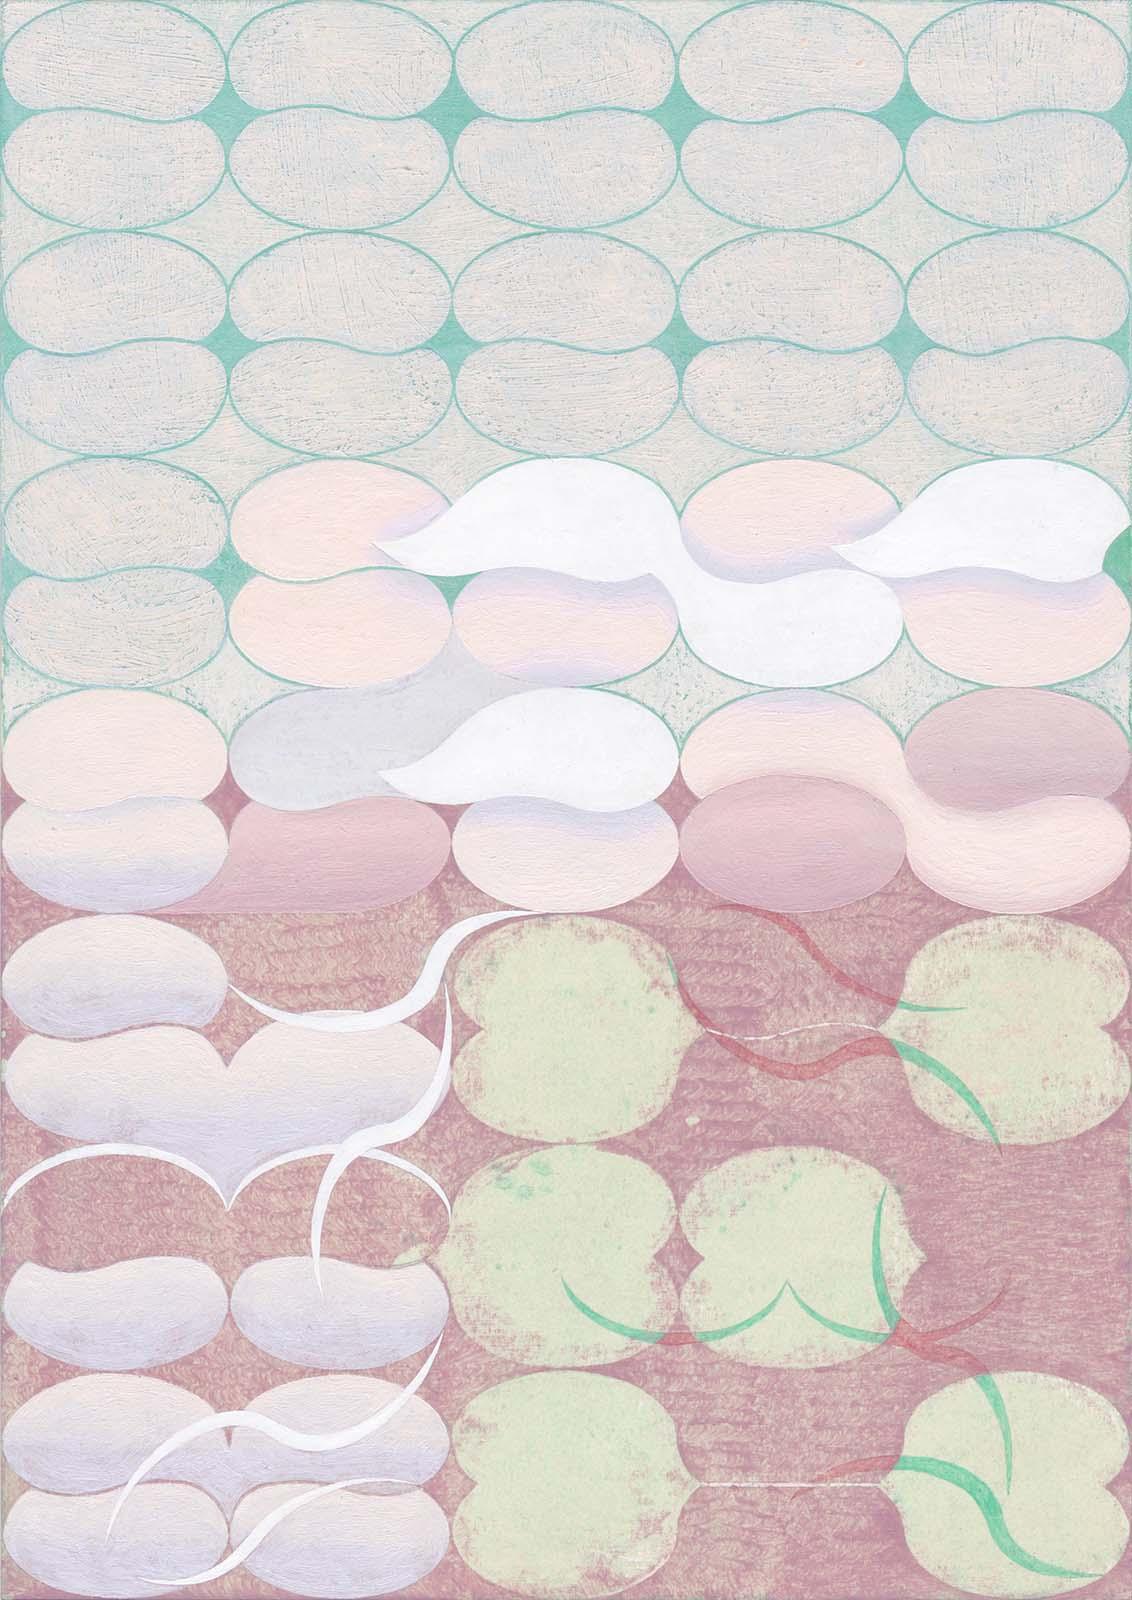 Jinyong Park, i- i-, acrylic on paper, 29.7 x 21 cm, 2018